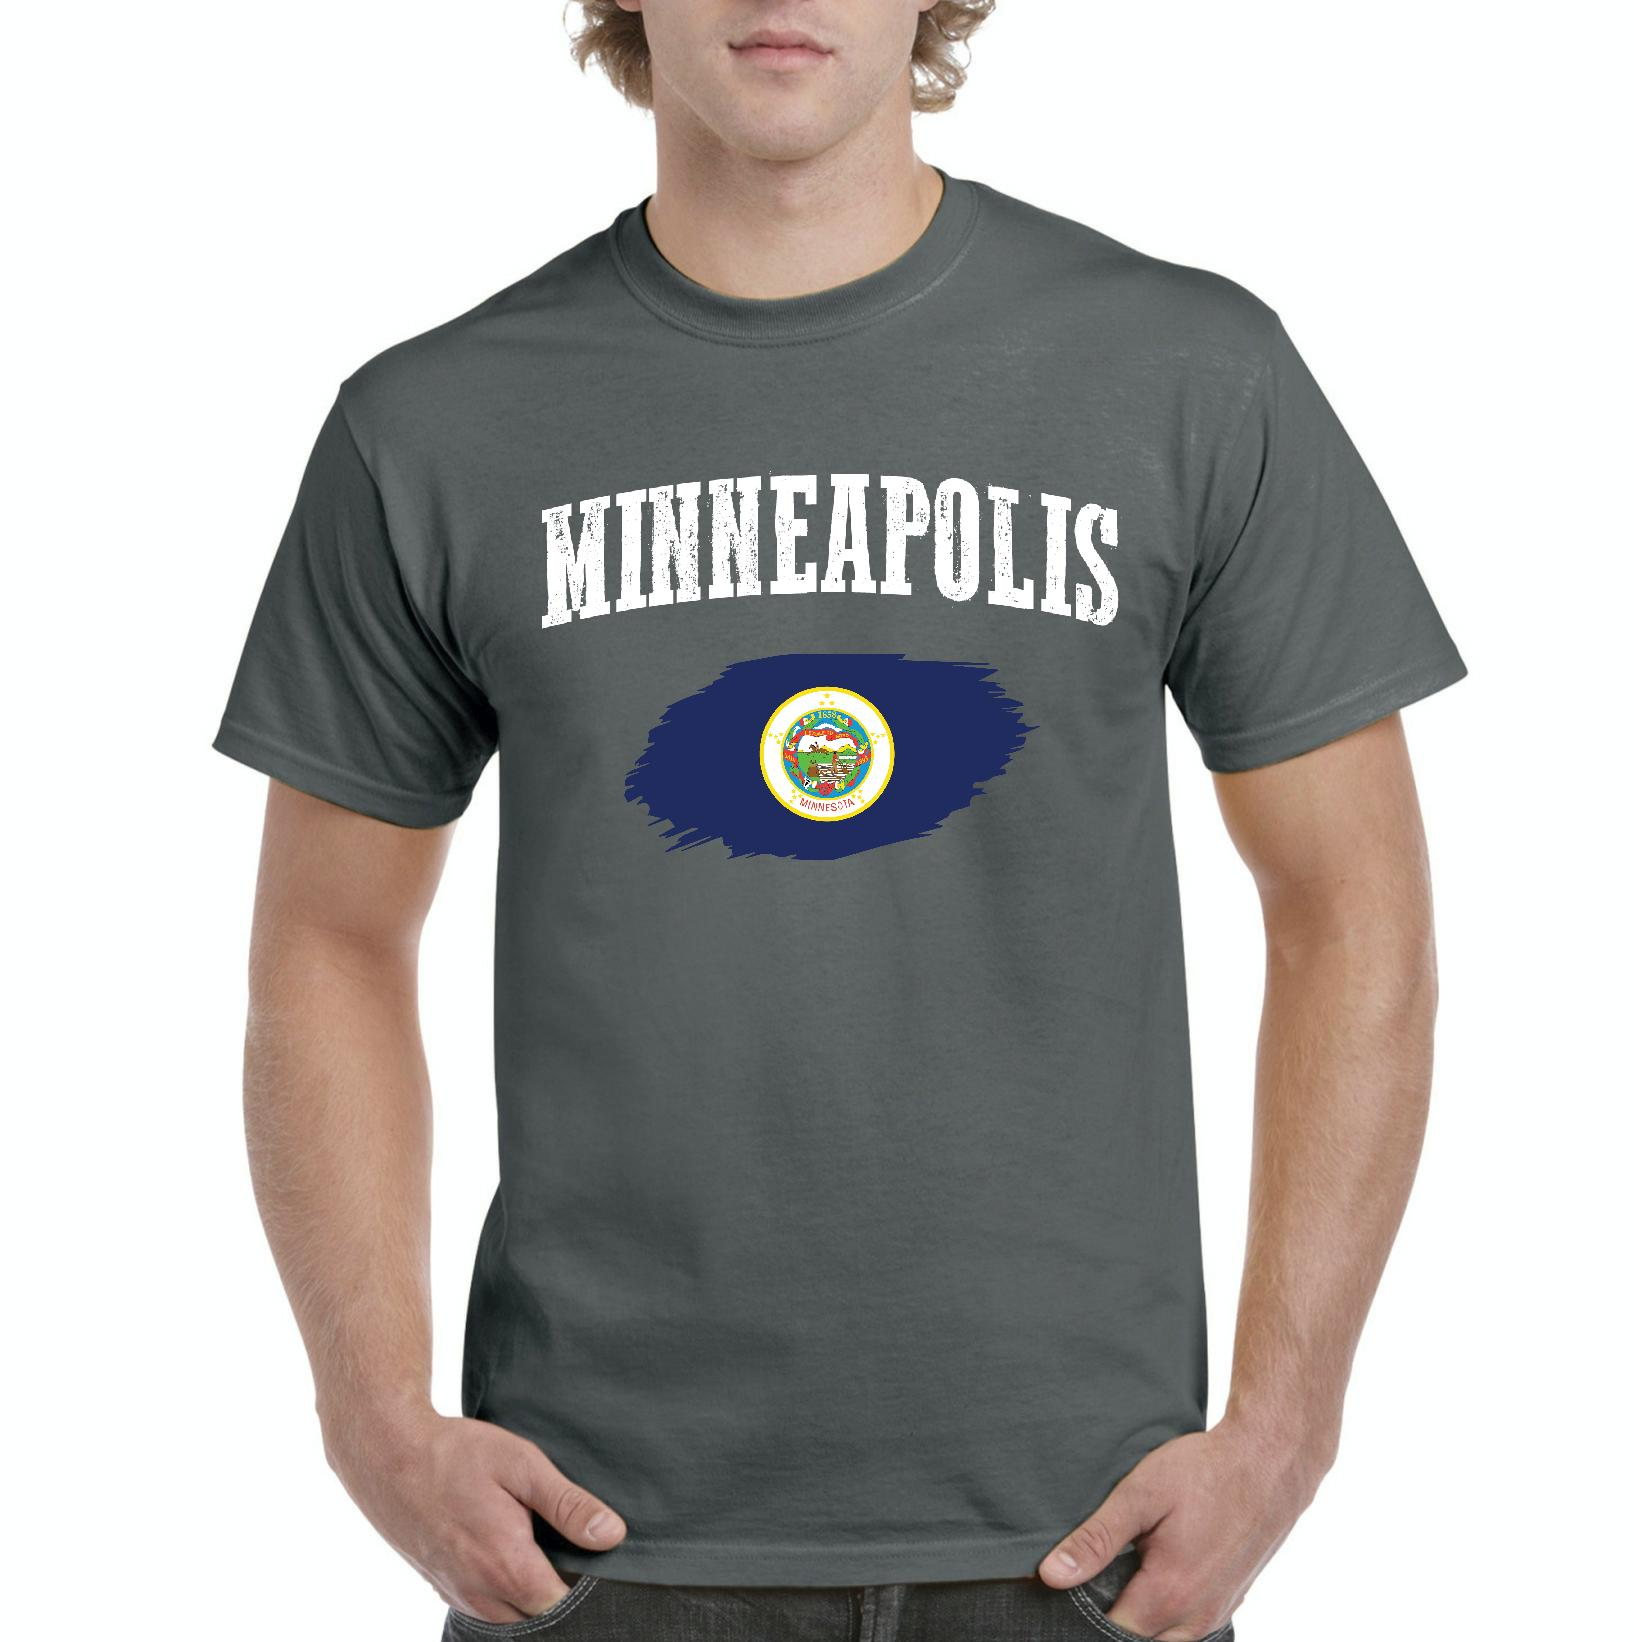 Minnesota Represent Kids T-shirt Minneapolis St Paul Baby Toddler Youth Tee